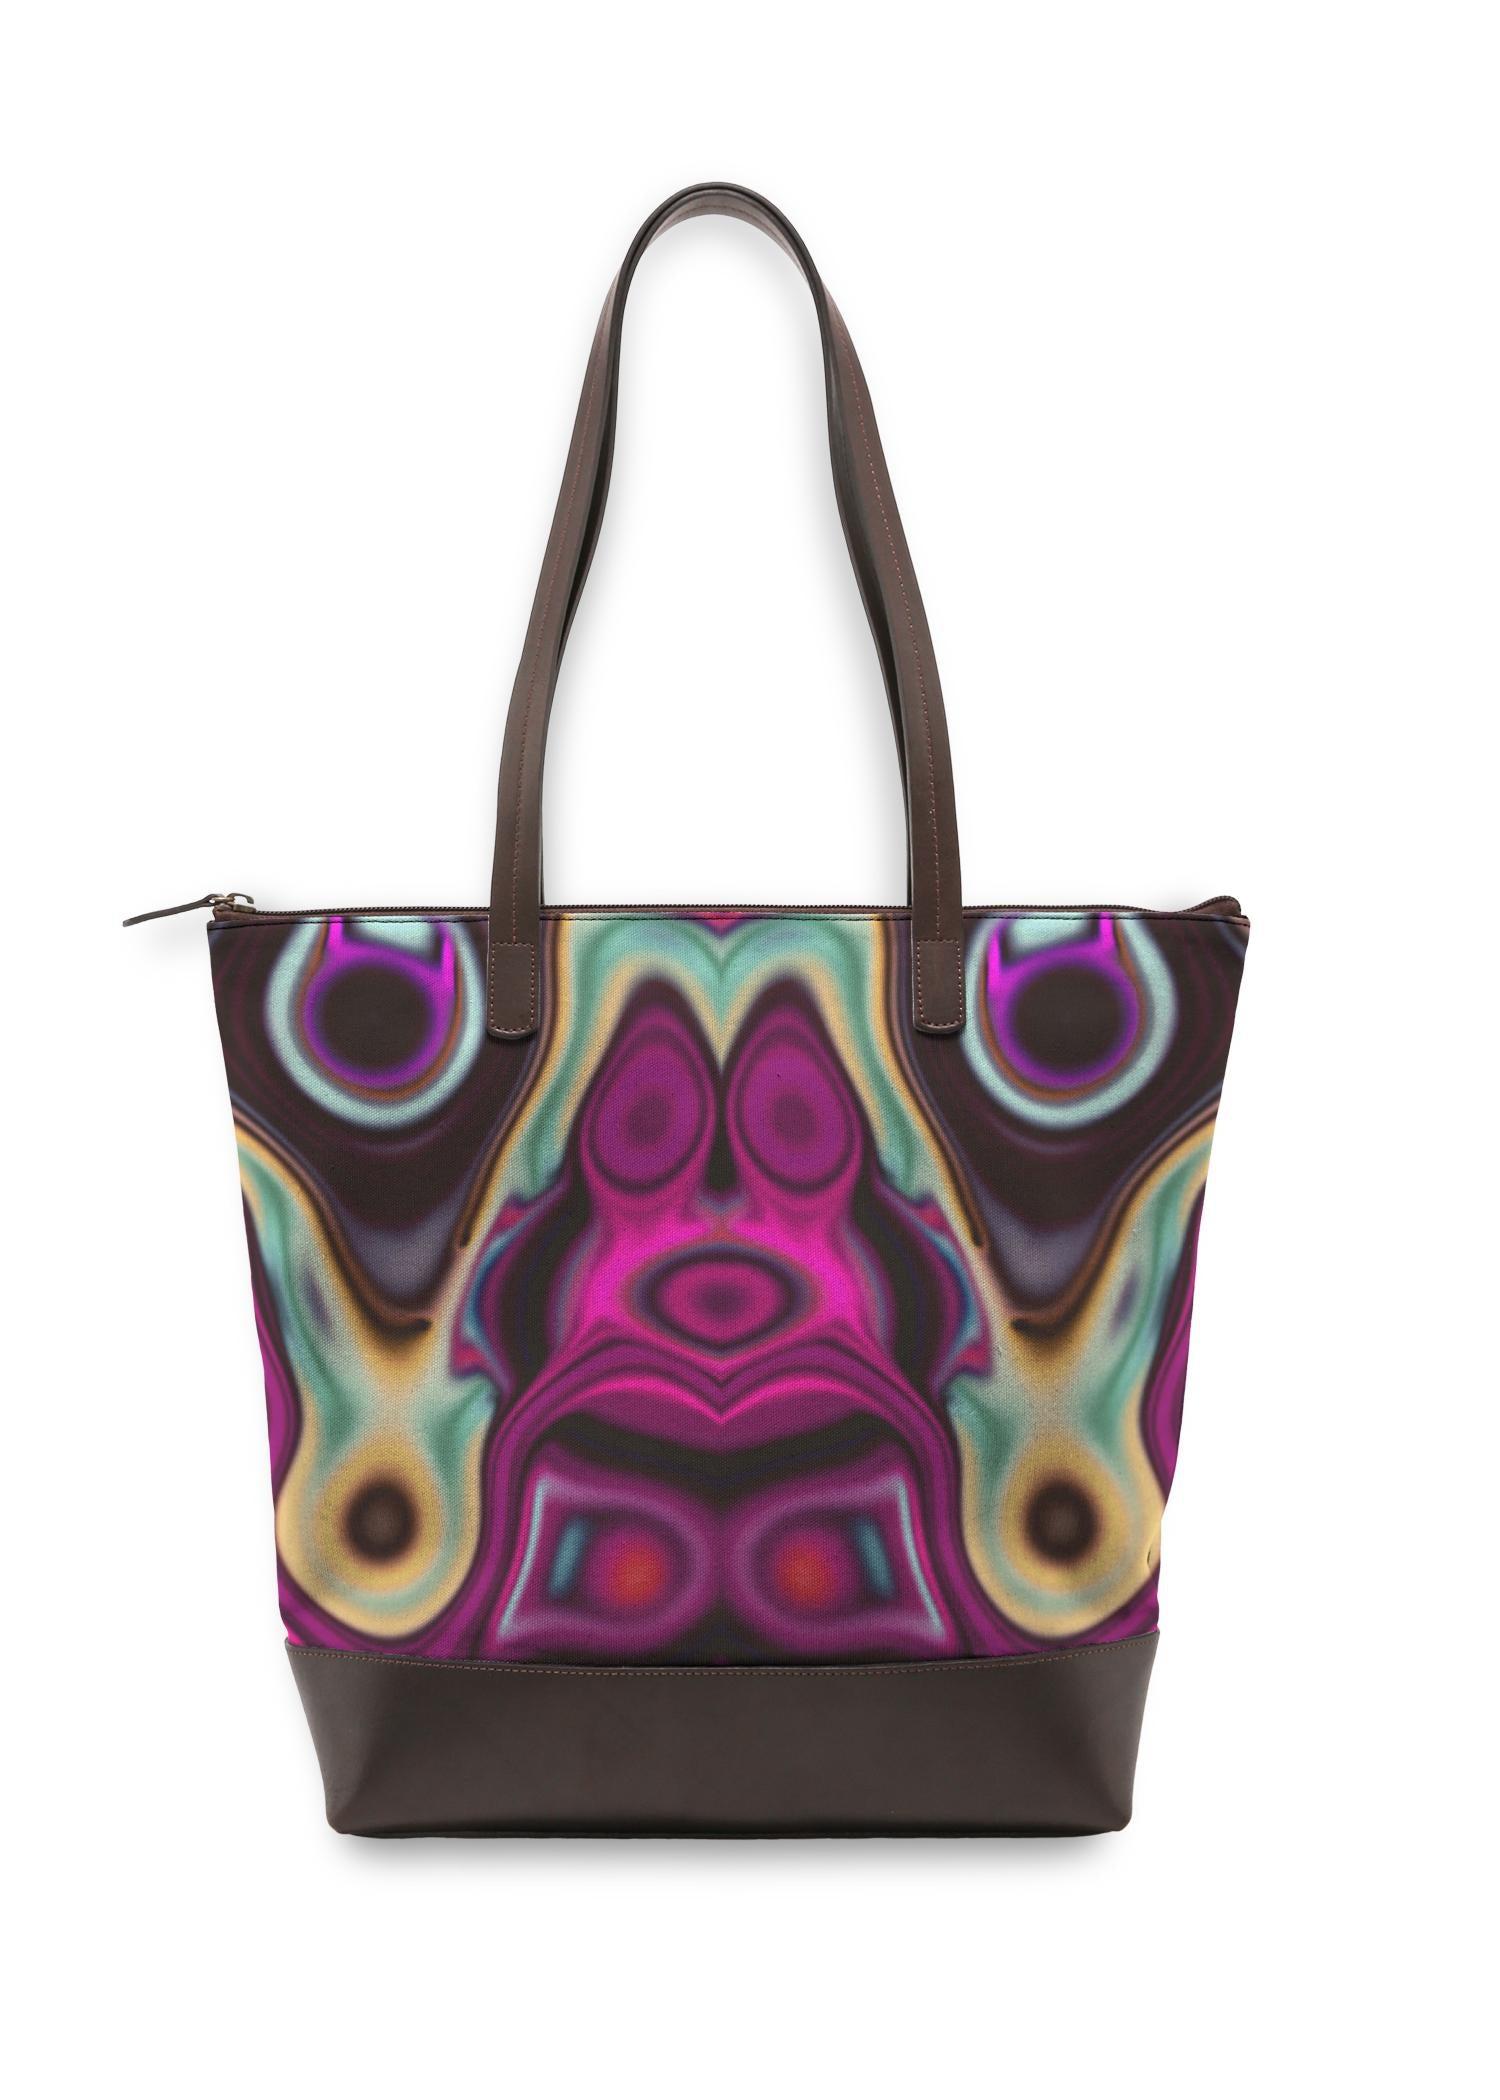 VIDA Statement Bag - Fashion Circles 7 by VIDA Original Artist  - Size: One Size